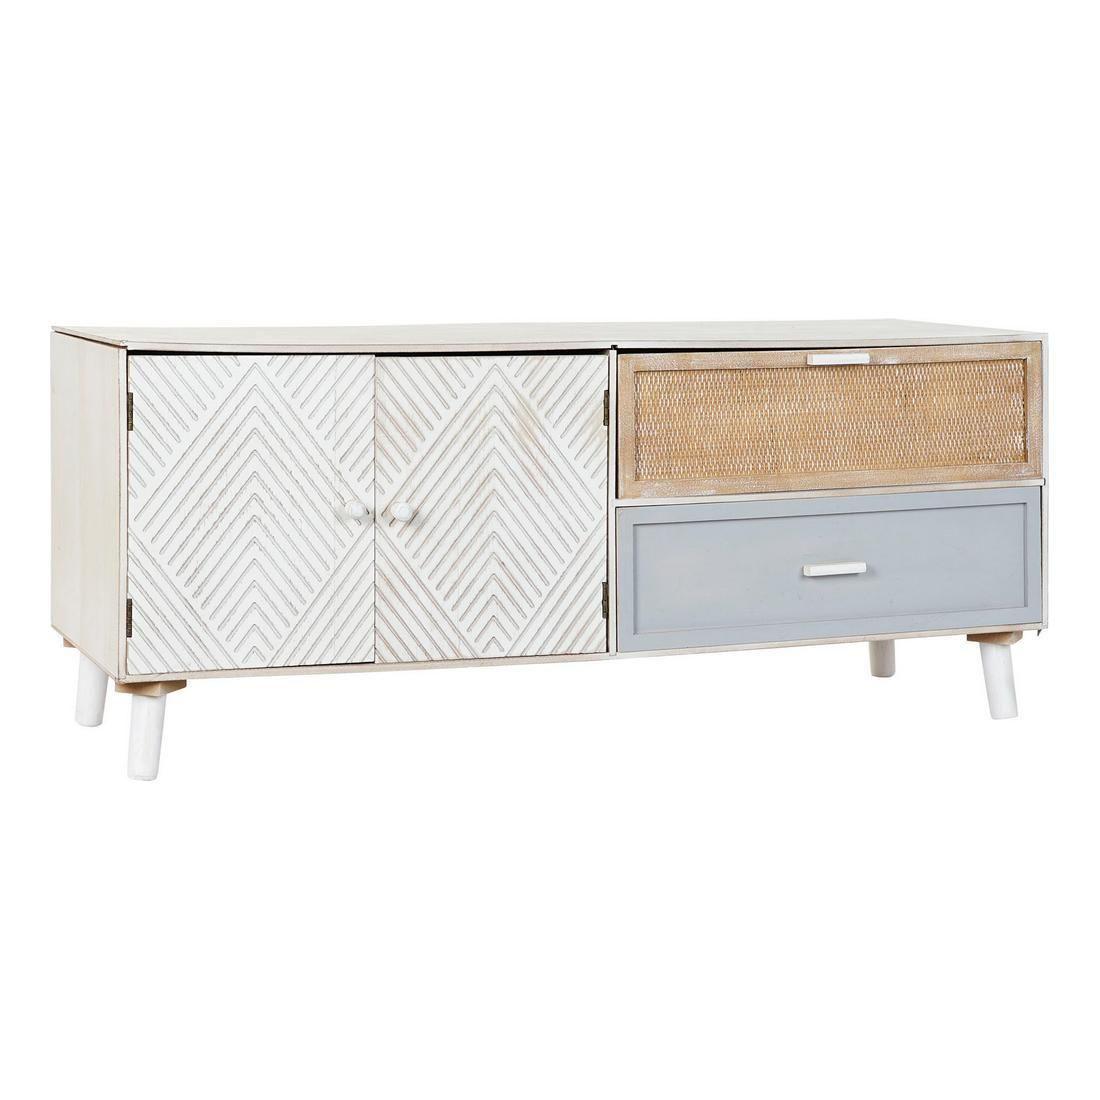 TV furniture DKD Home Decor White Grey Wood (120 x 40 x 50 c…